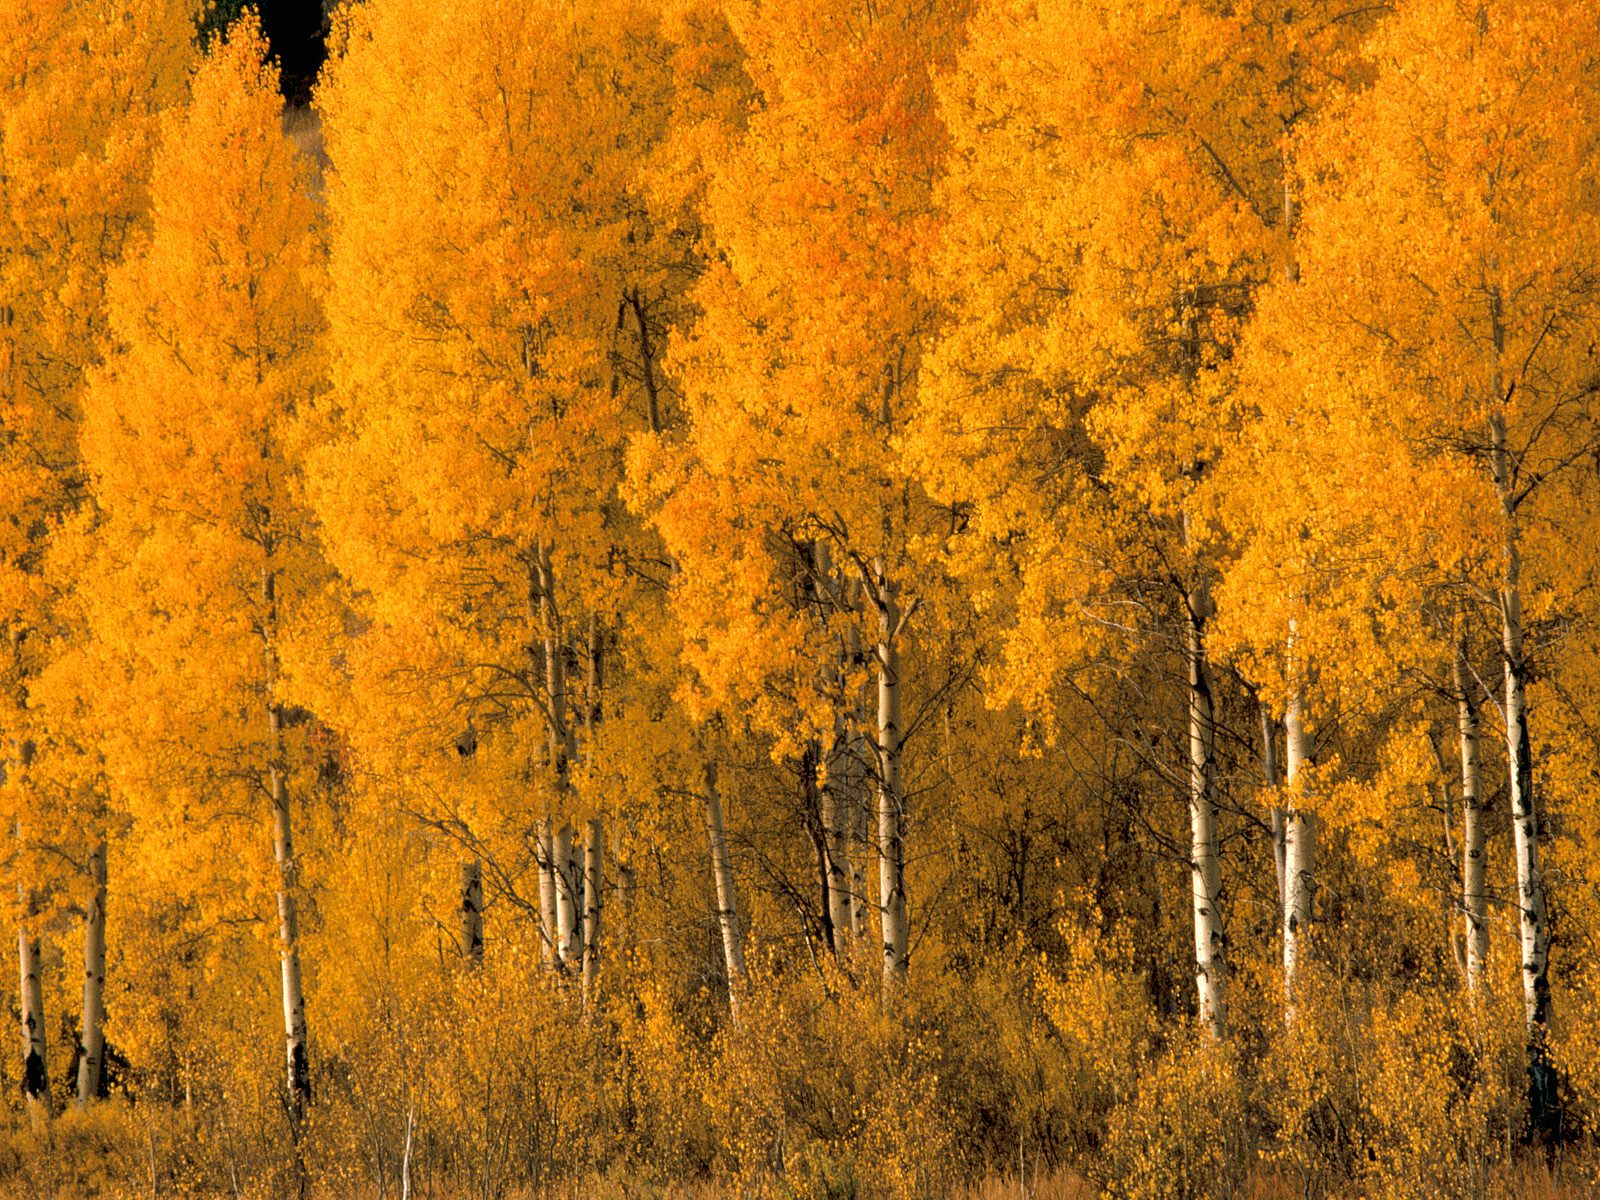 Aspen Tree Wallpaper For Home Wallpapersafari